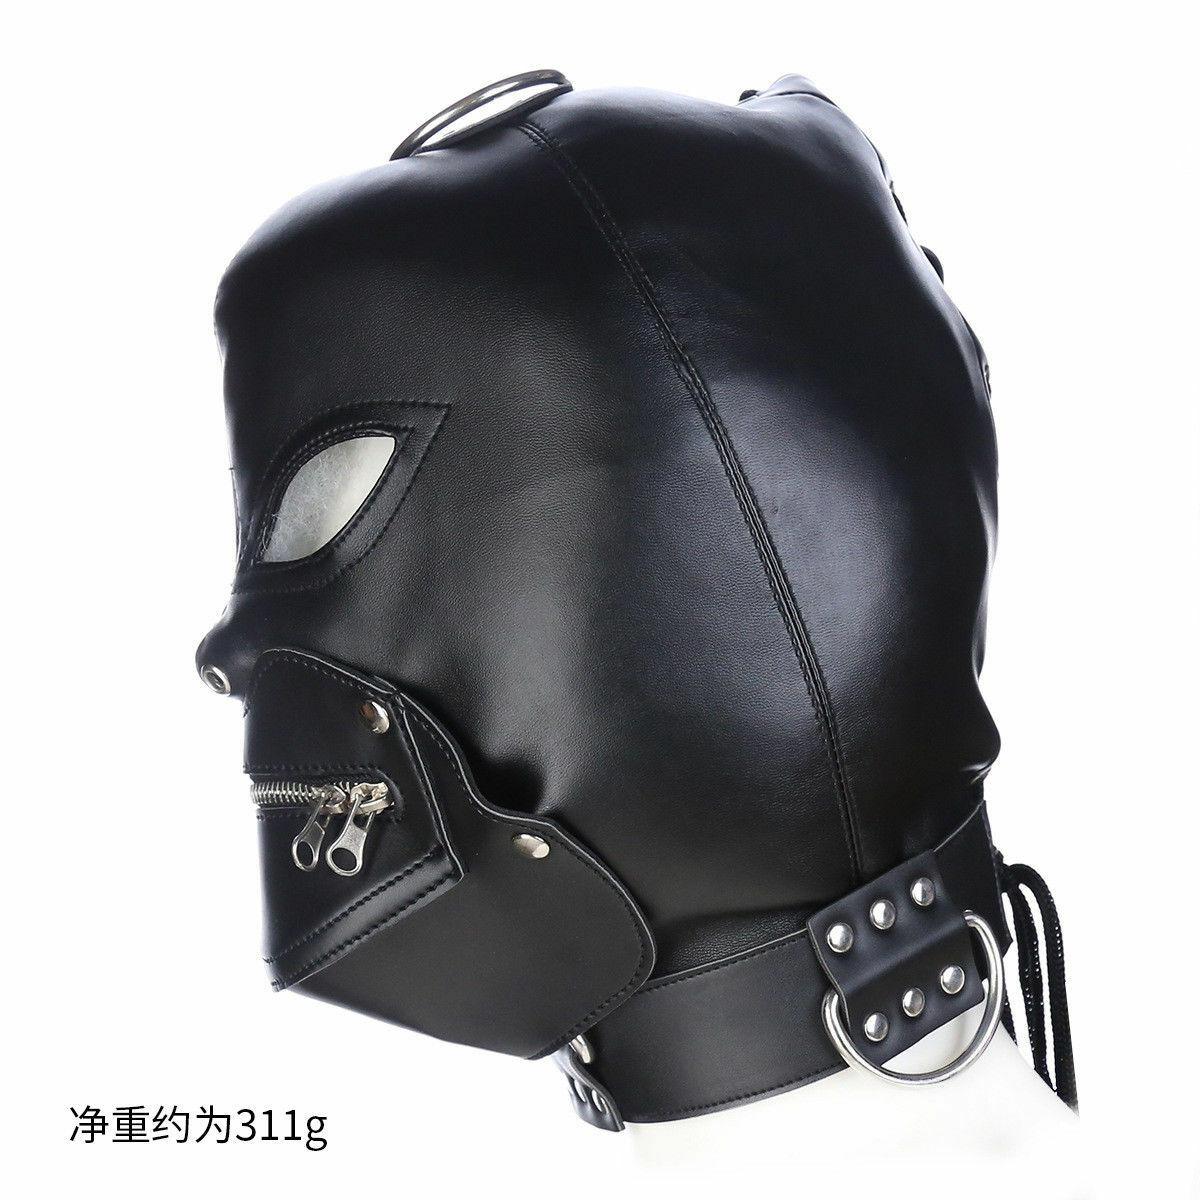 Leather Mask Hood Zipper mouth gag Halloween Full Gimp Open Eyes lockable slave